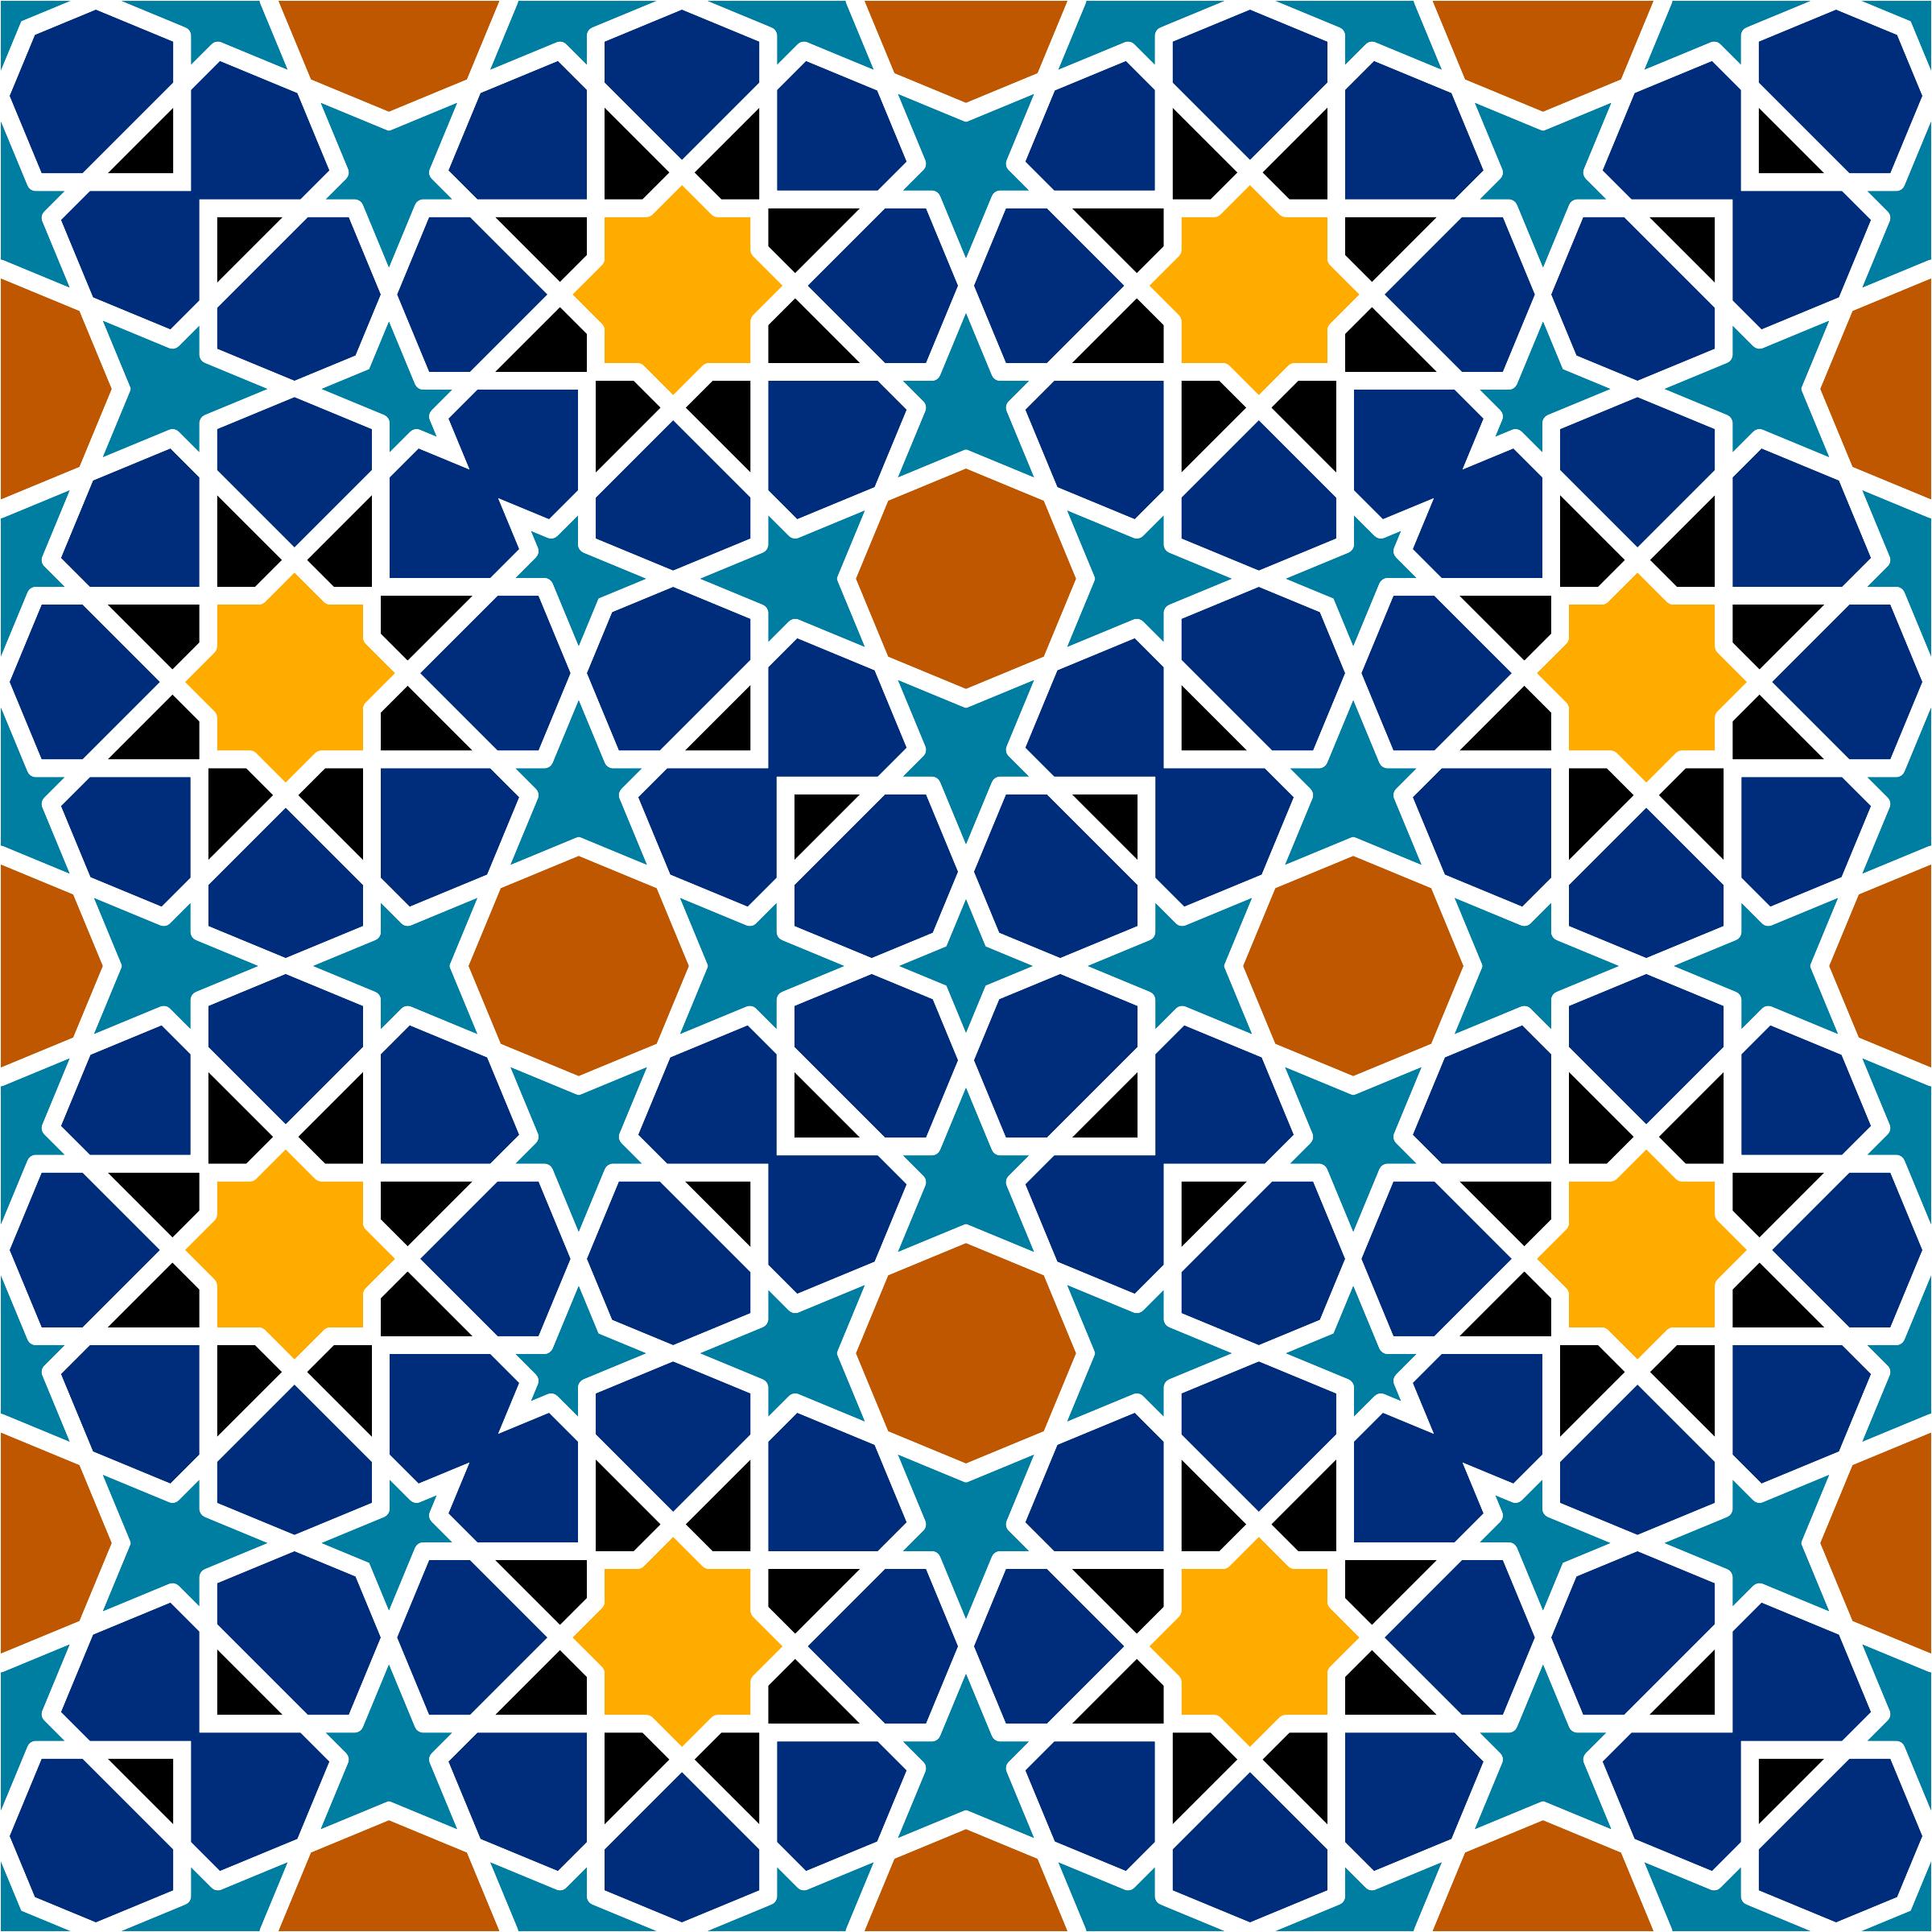 clipart islamic geometric tile 2 mosque clipart images mosque clipart images